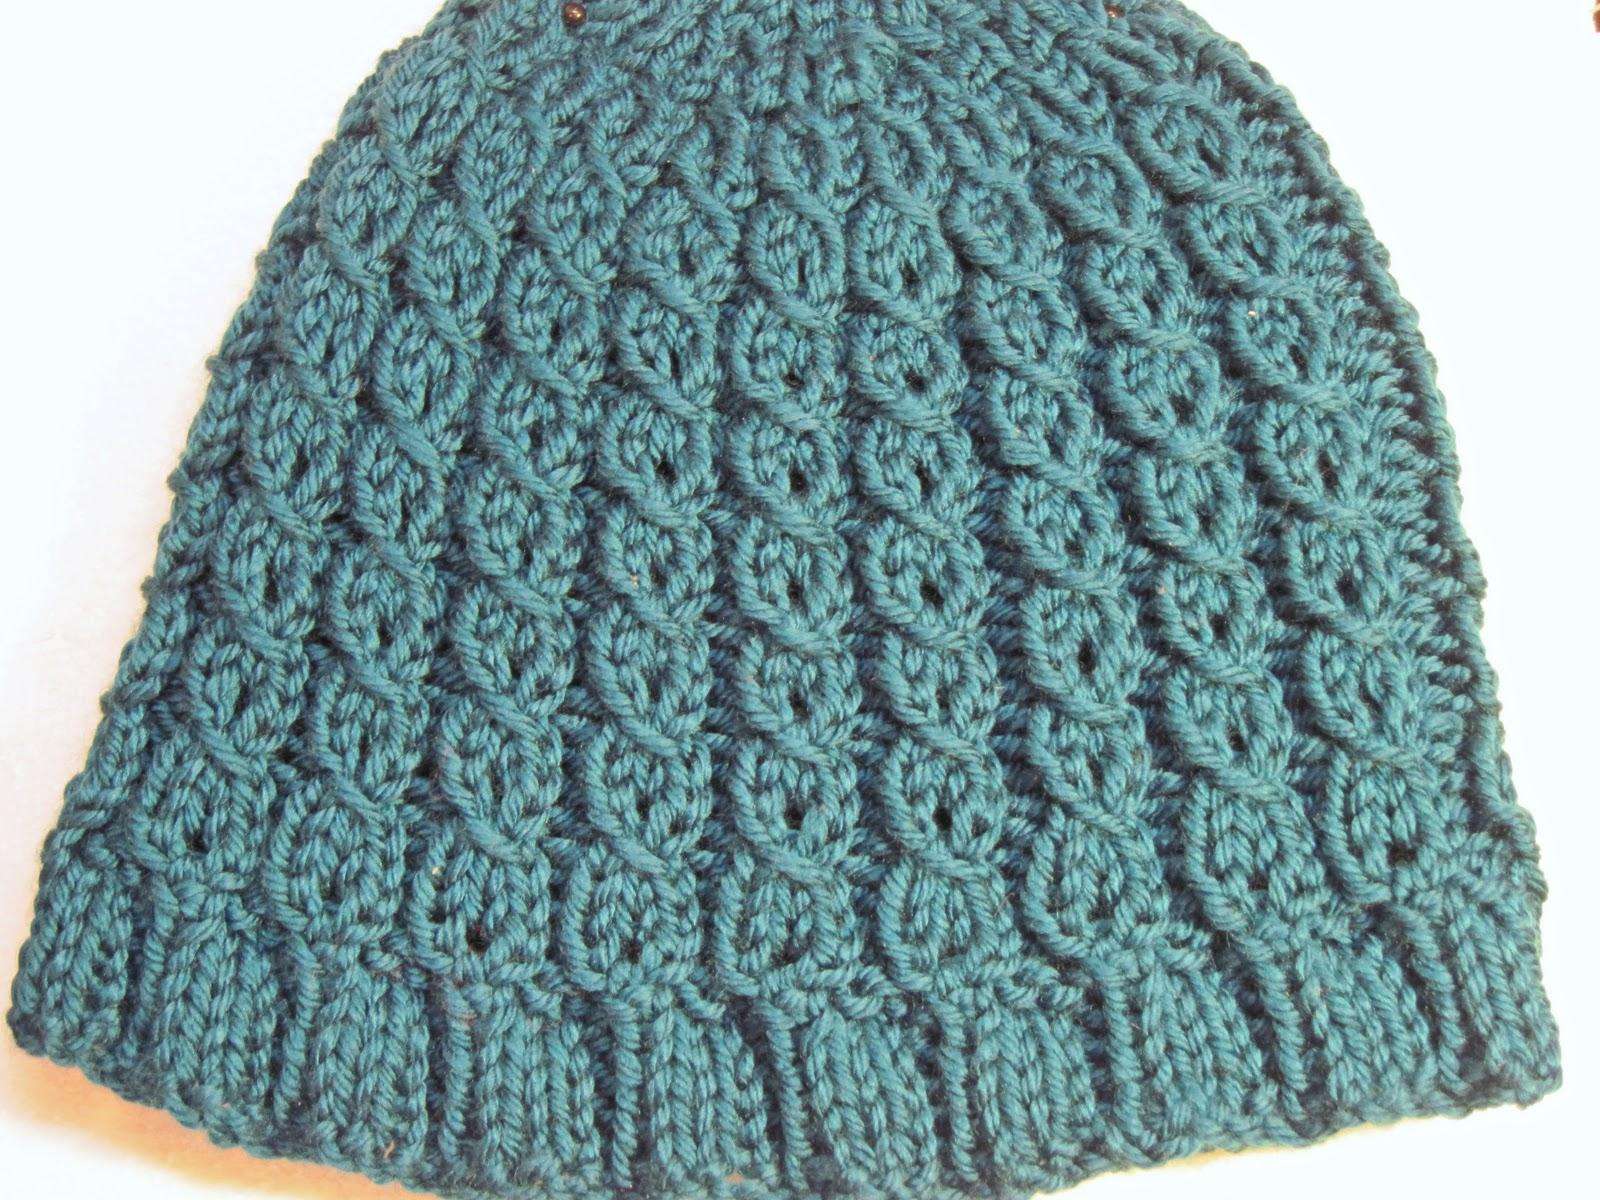 Mock Cable Knit Hat Pattern 2cbdb6216e8